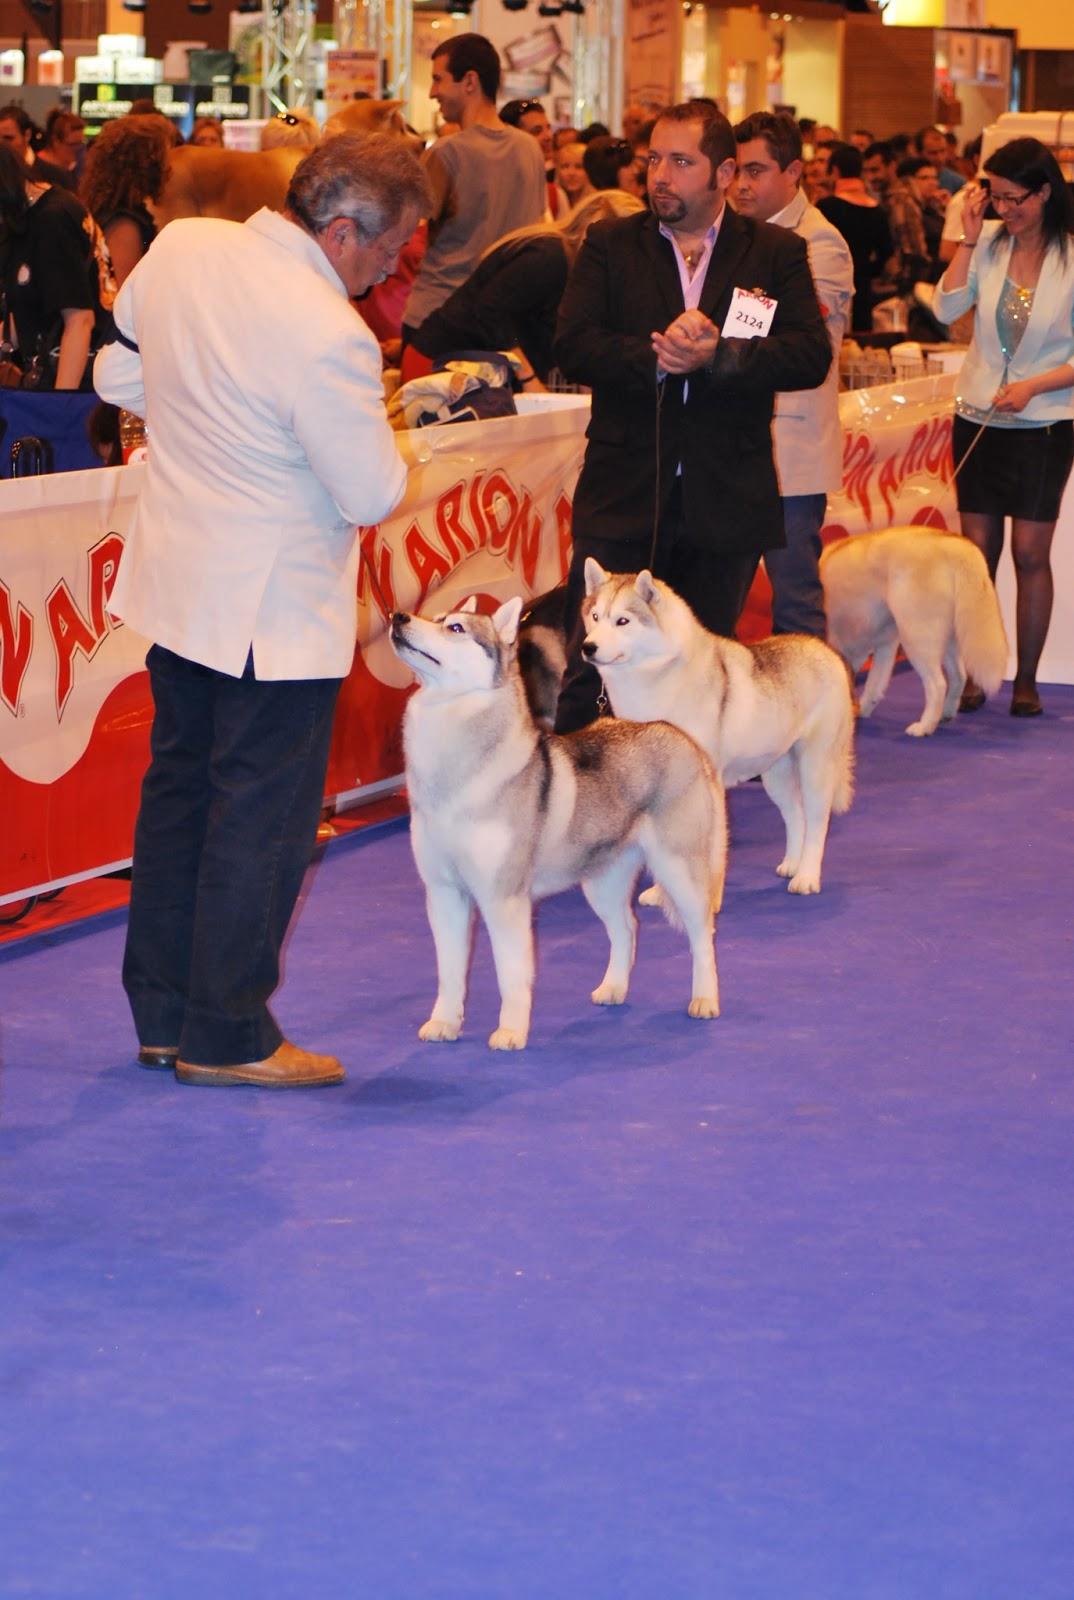 Clase Abierta Hembras Exposicion Canina Madrid 2013 Geysha de Artic Grana